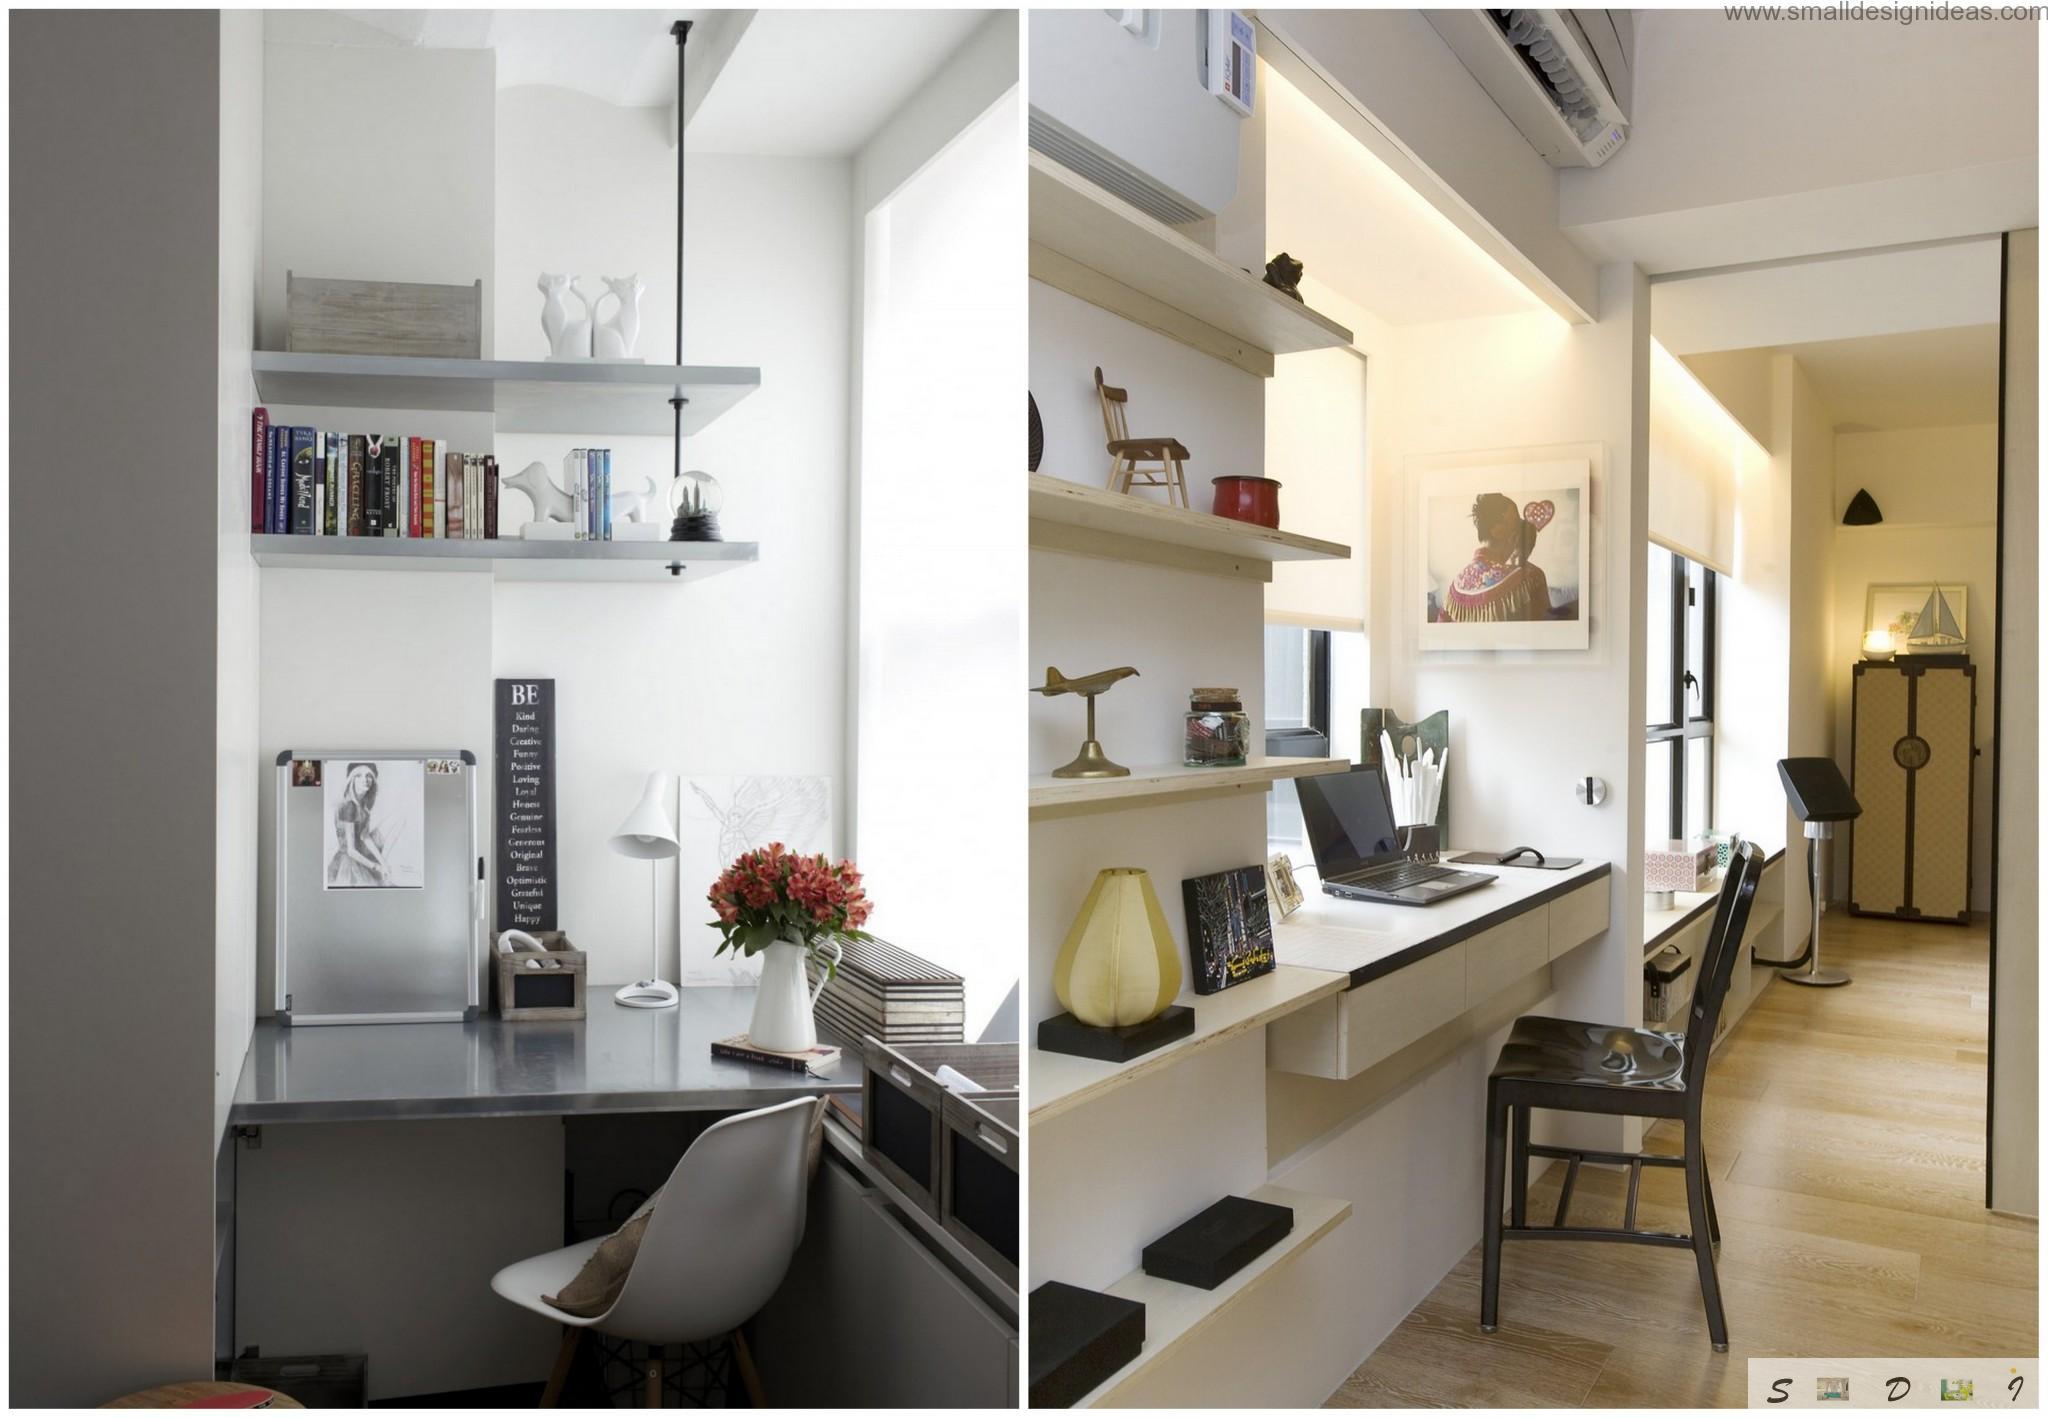 Small Home Office No Window 2048x1418 Wallpaper Teahub Io